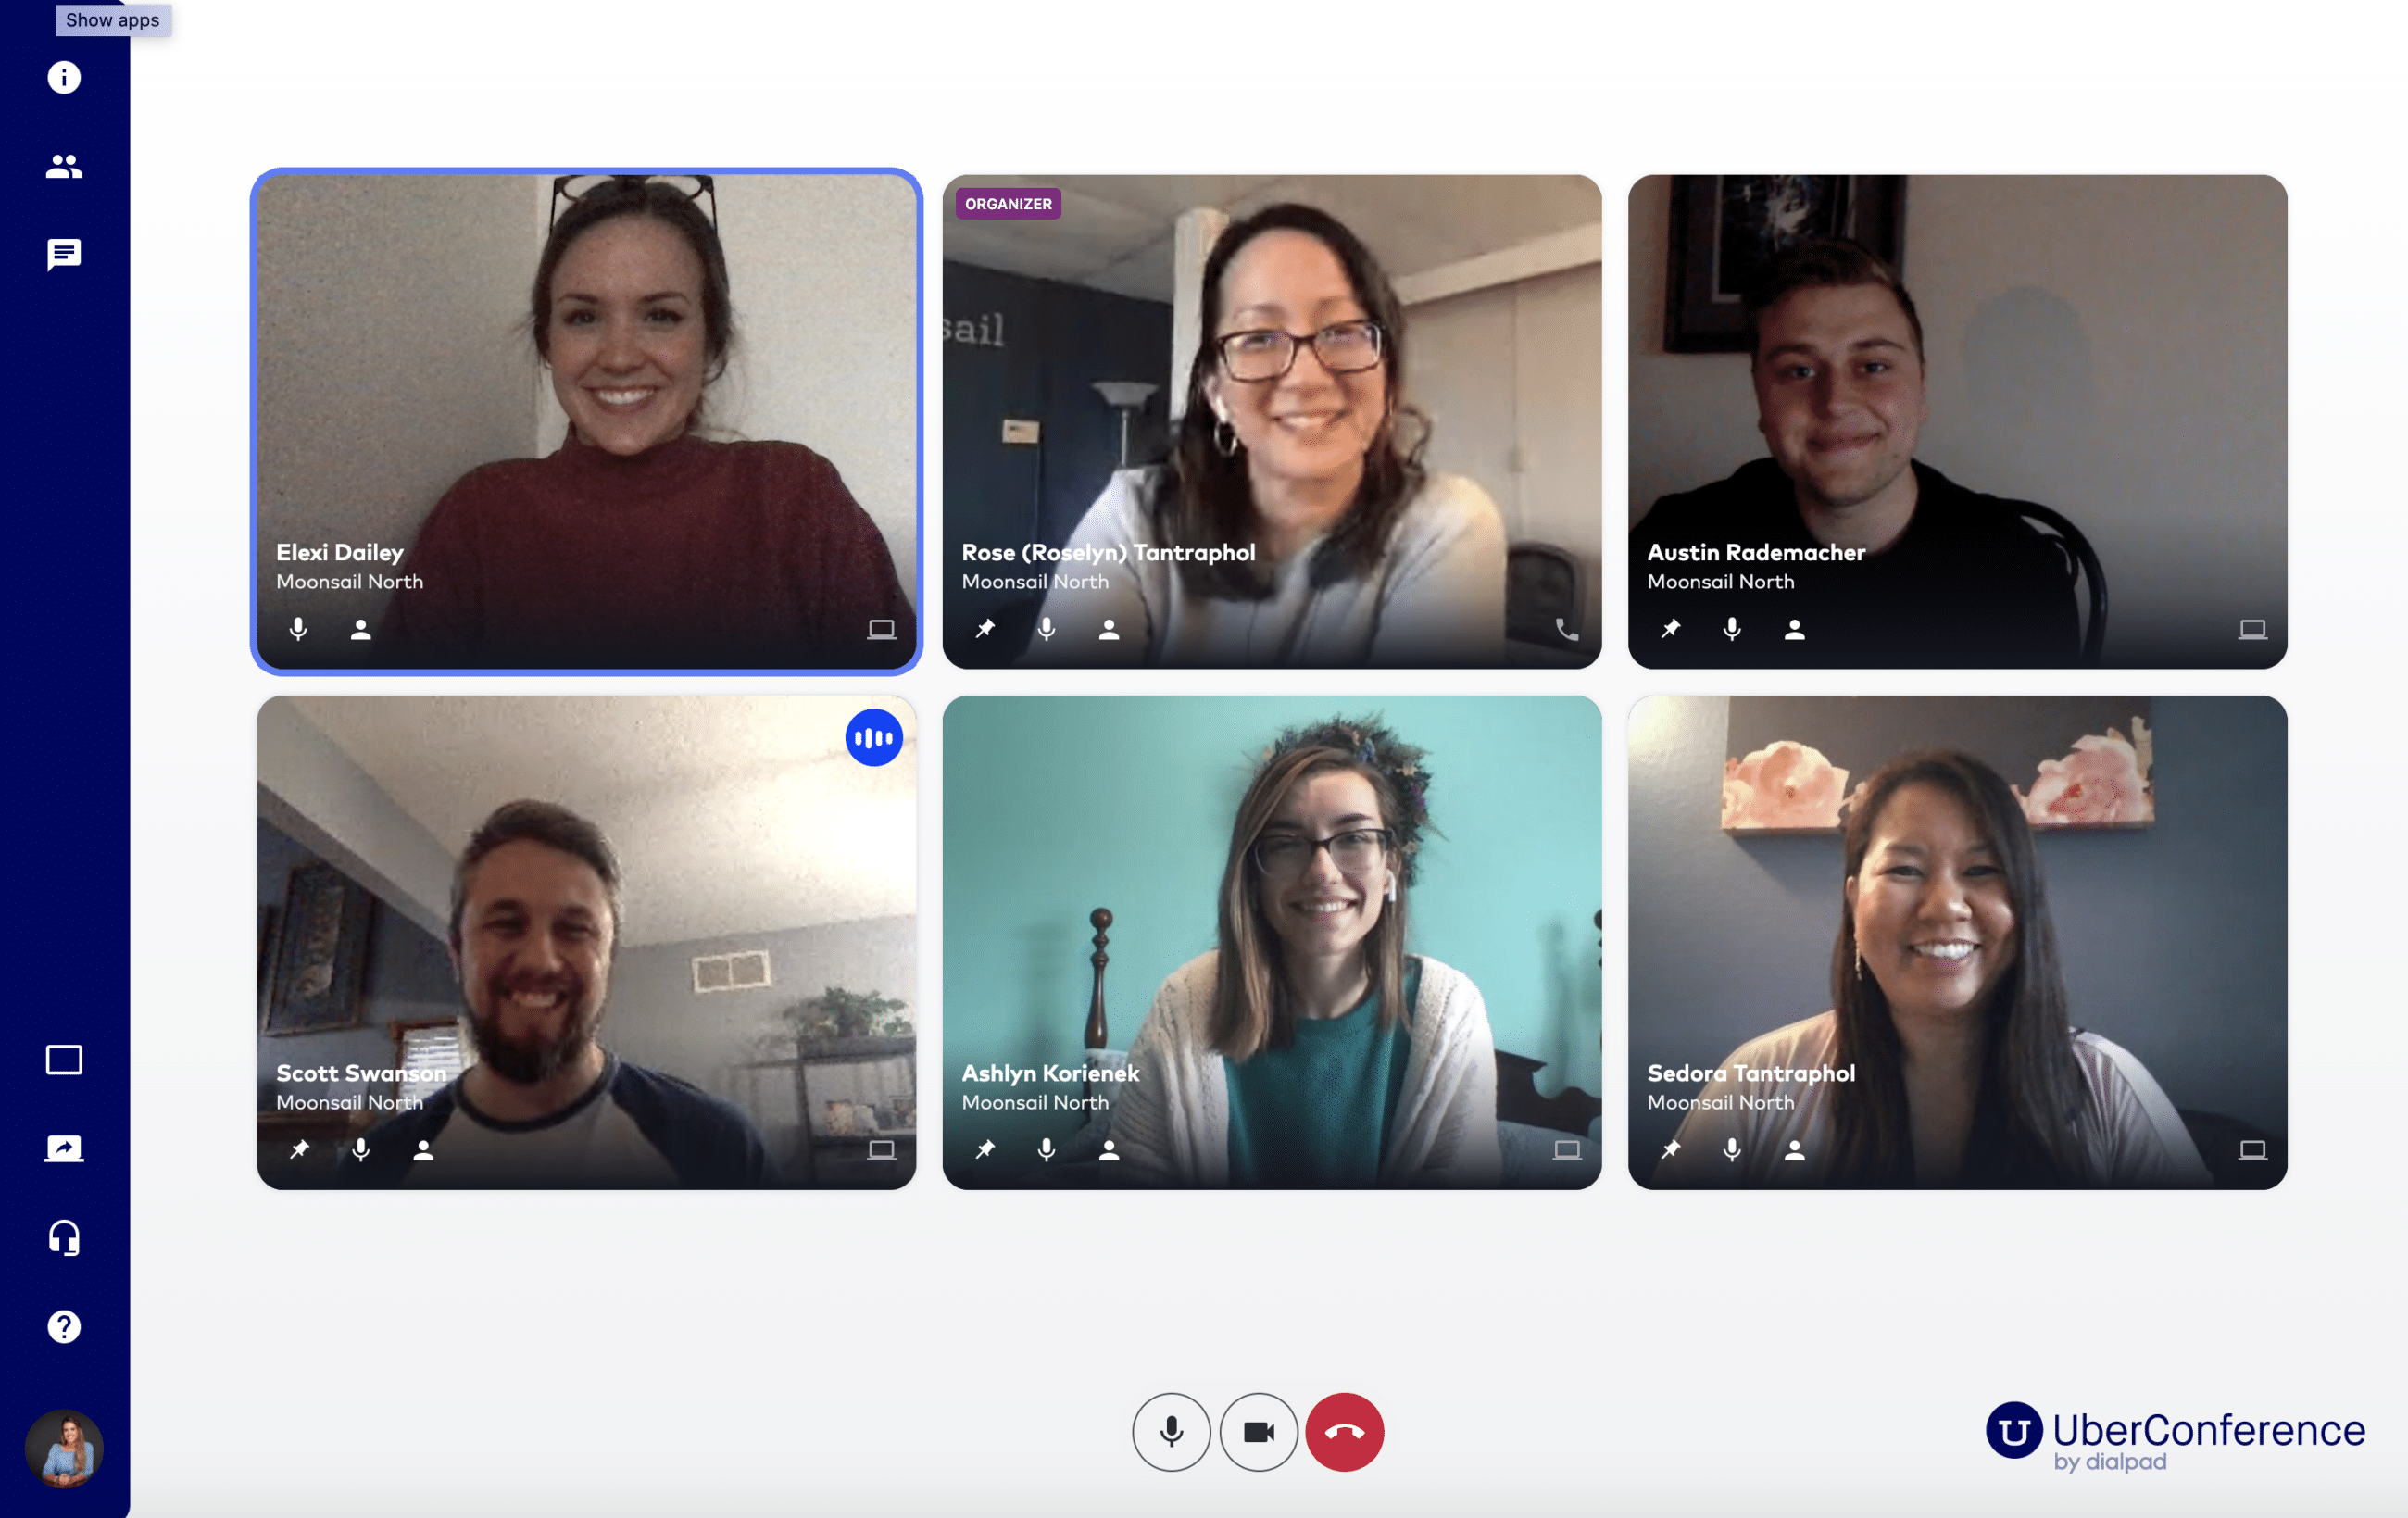 UberConference screenshot of Moonsail North team members